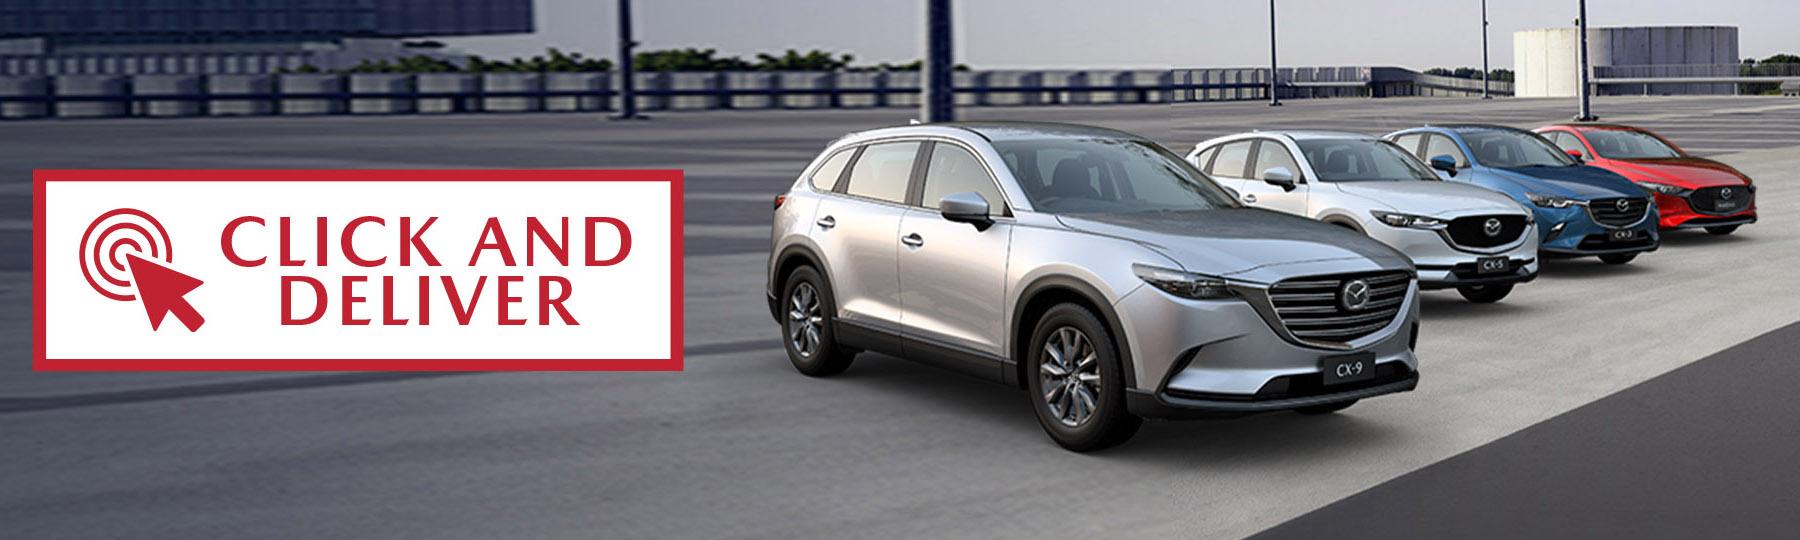 Mazda Click and Deliver